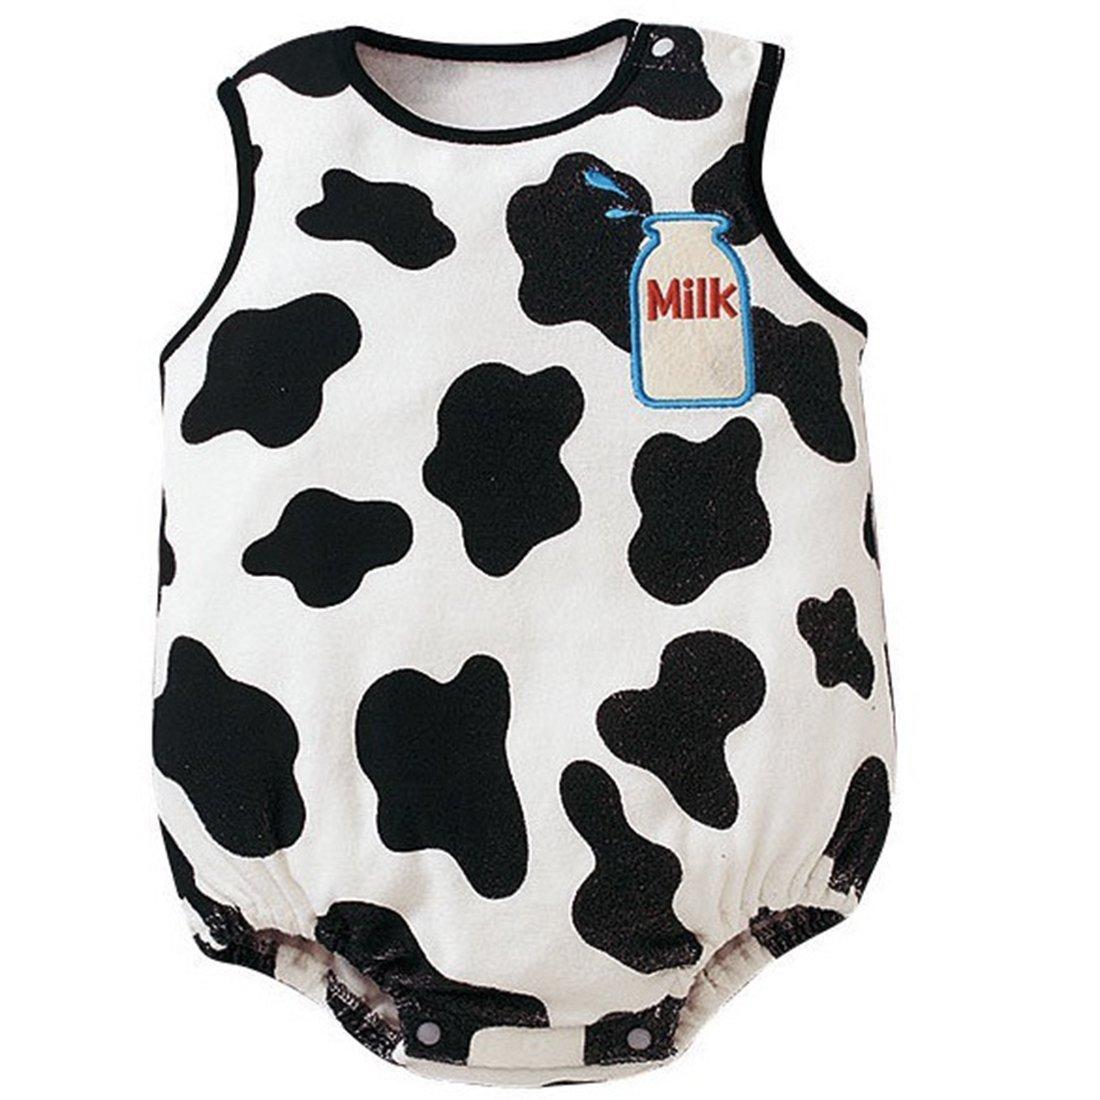 Newborn Baby Boy Girl Personalized Birthday Party All-in-one Romper Bodysuit